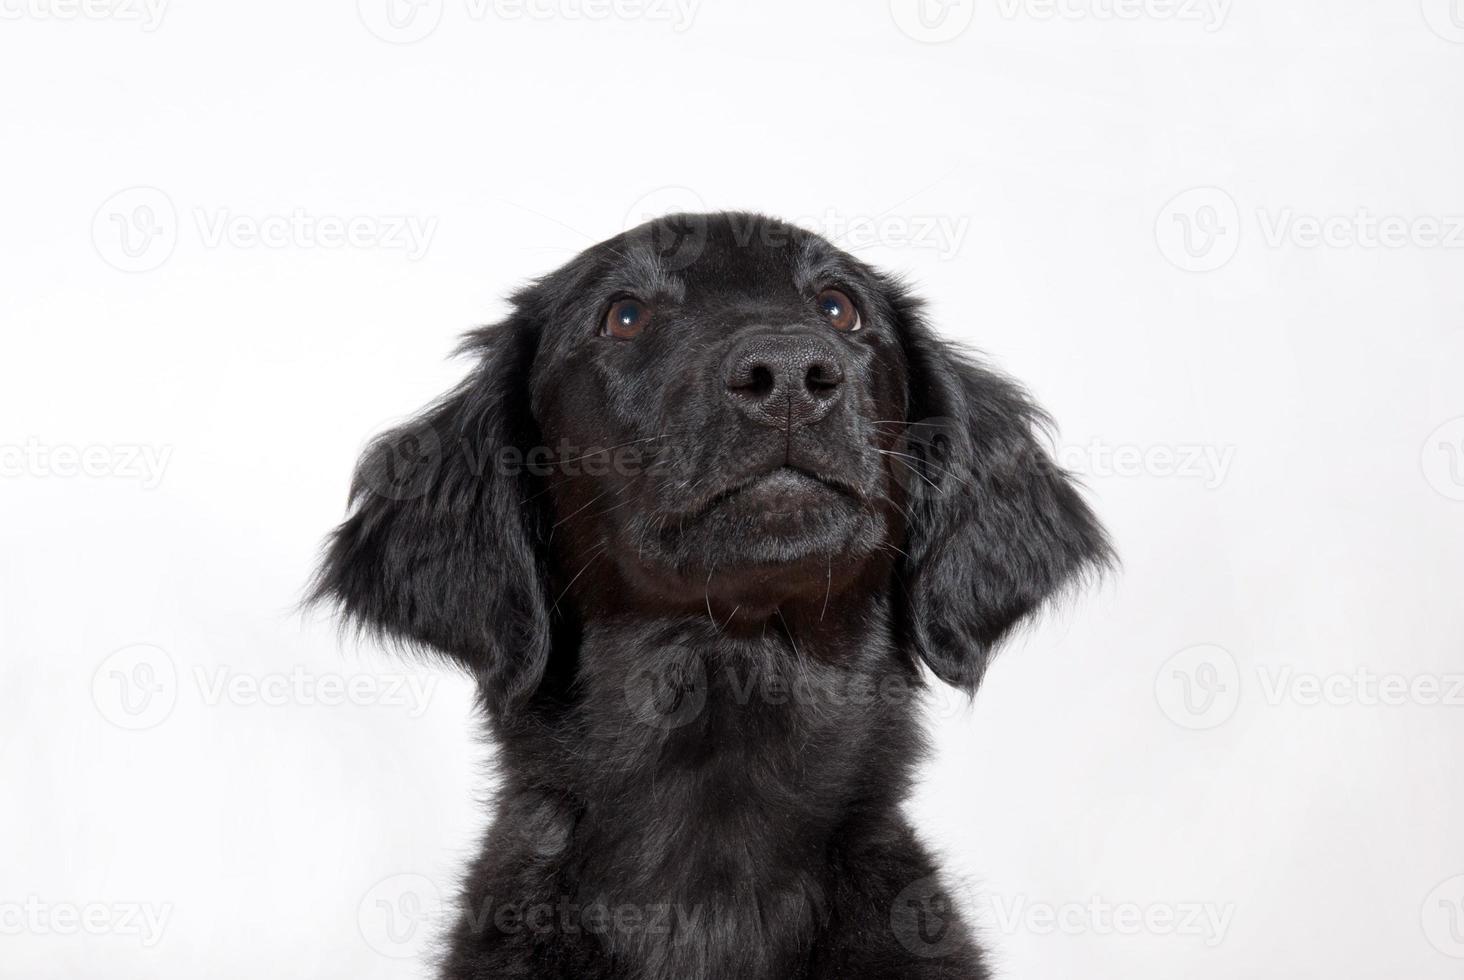 cucciolo nero foto